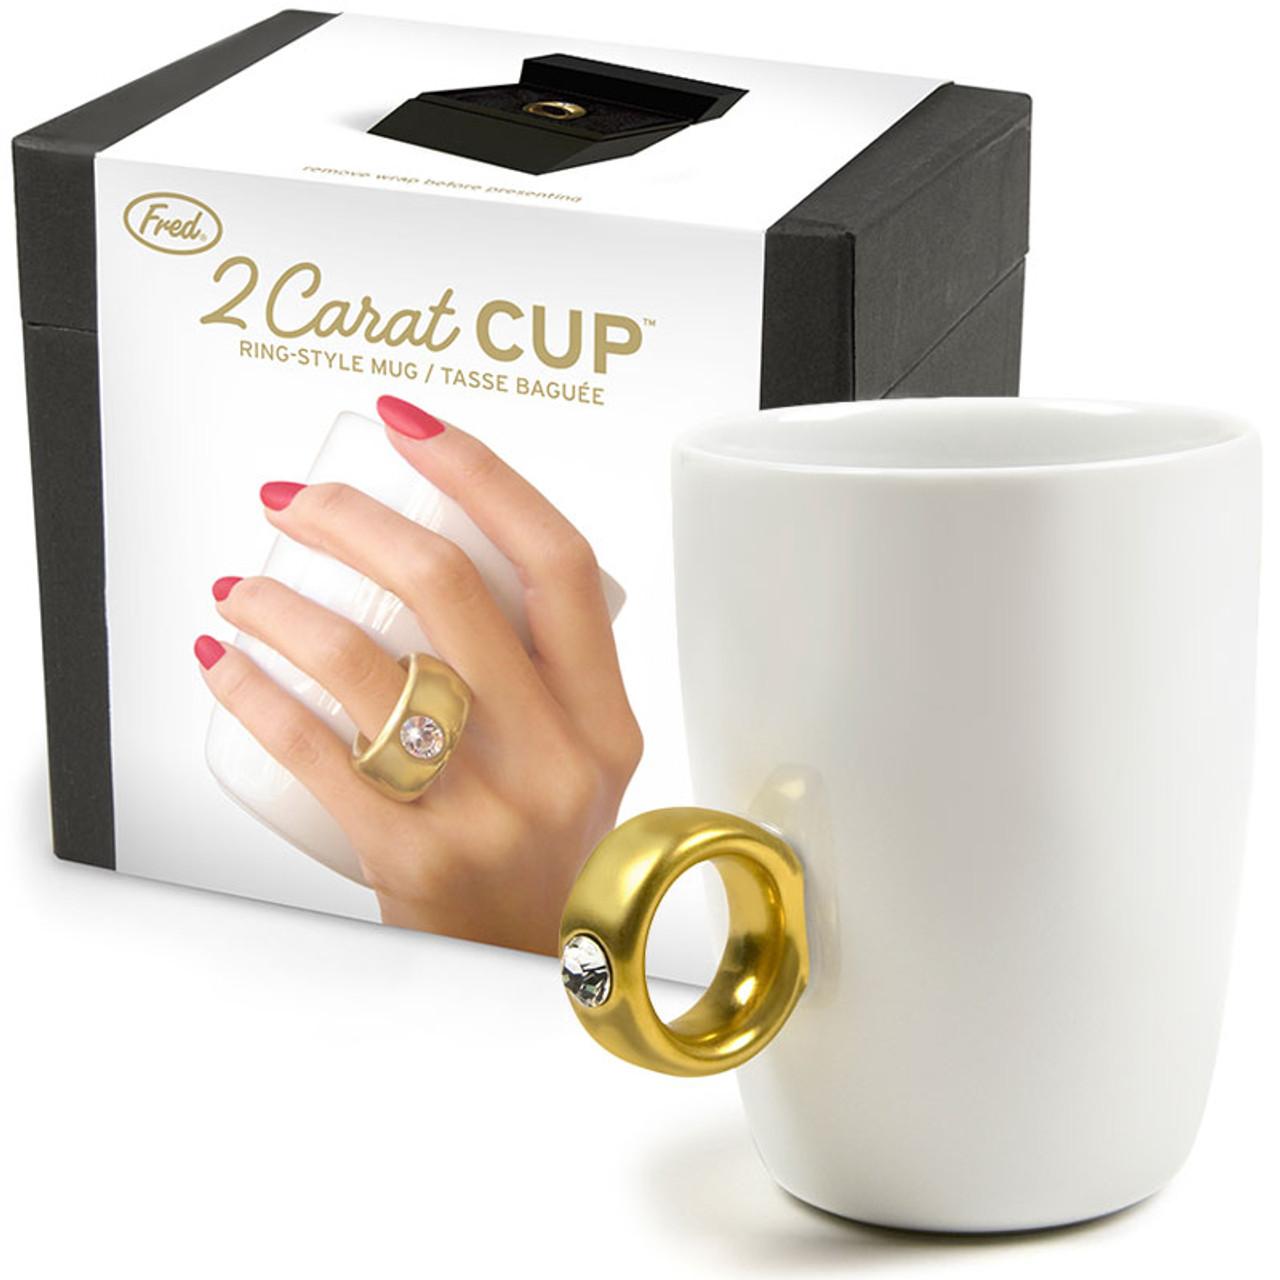 2 Carat Cup